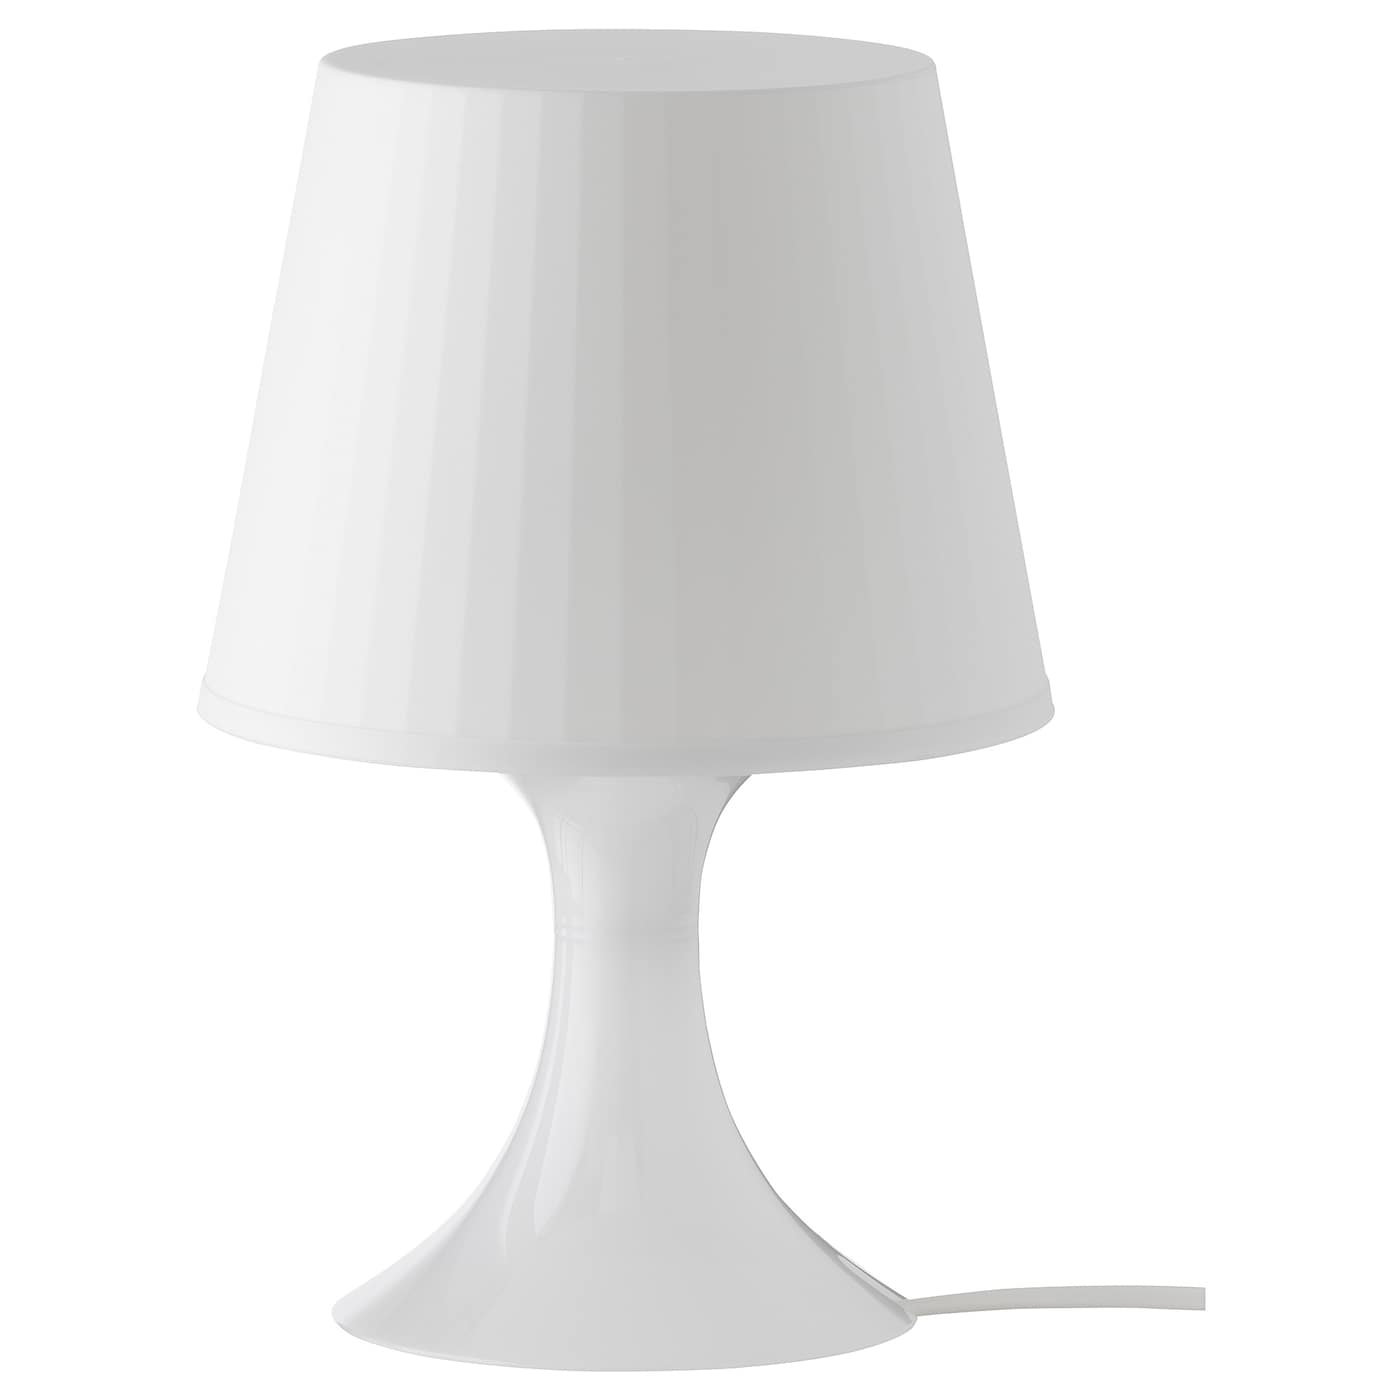 Lampan table lamp white ikea ikea lampan table lamp creates a soft cosy mood light in your room aloadofball Images